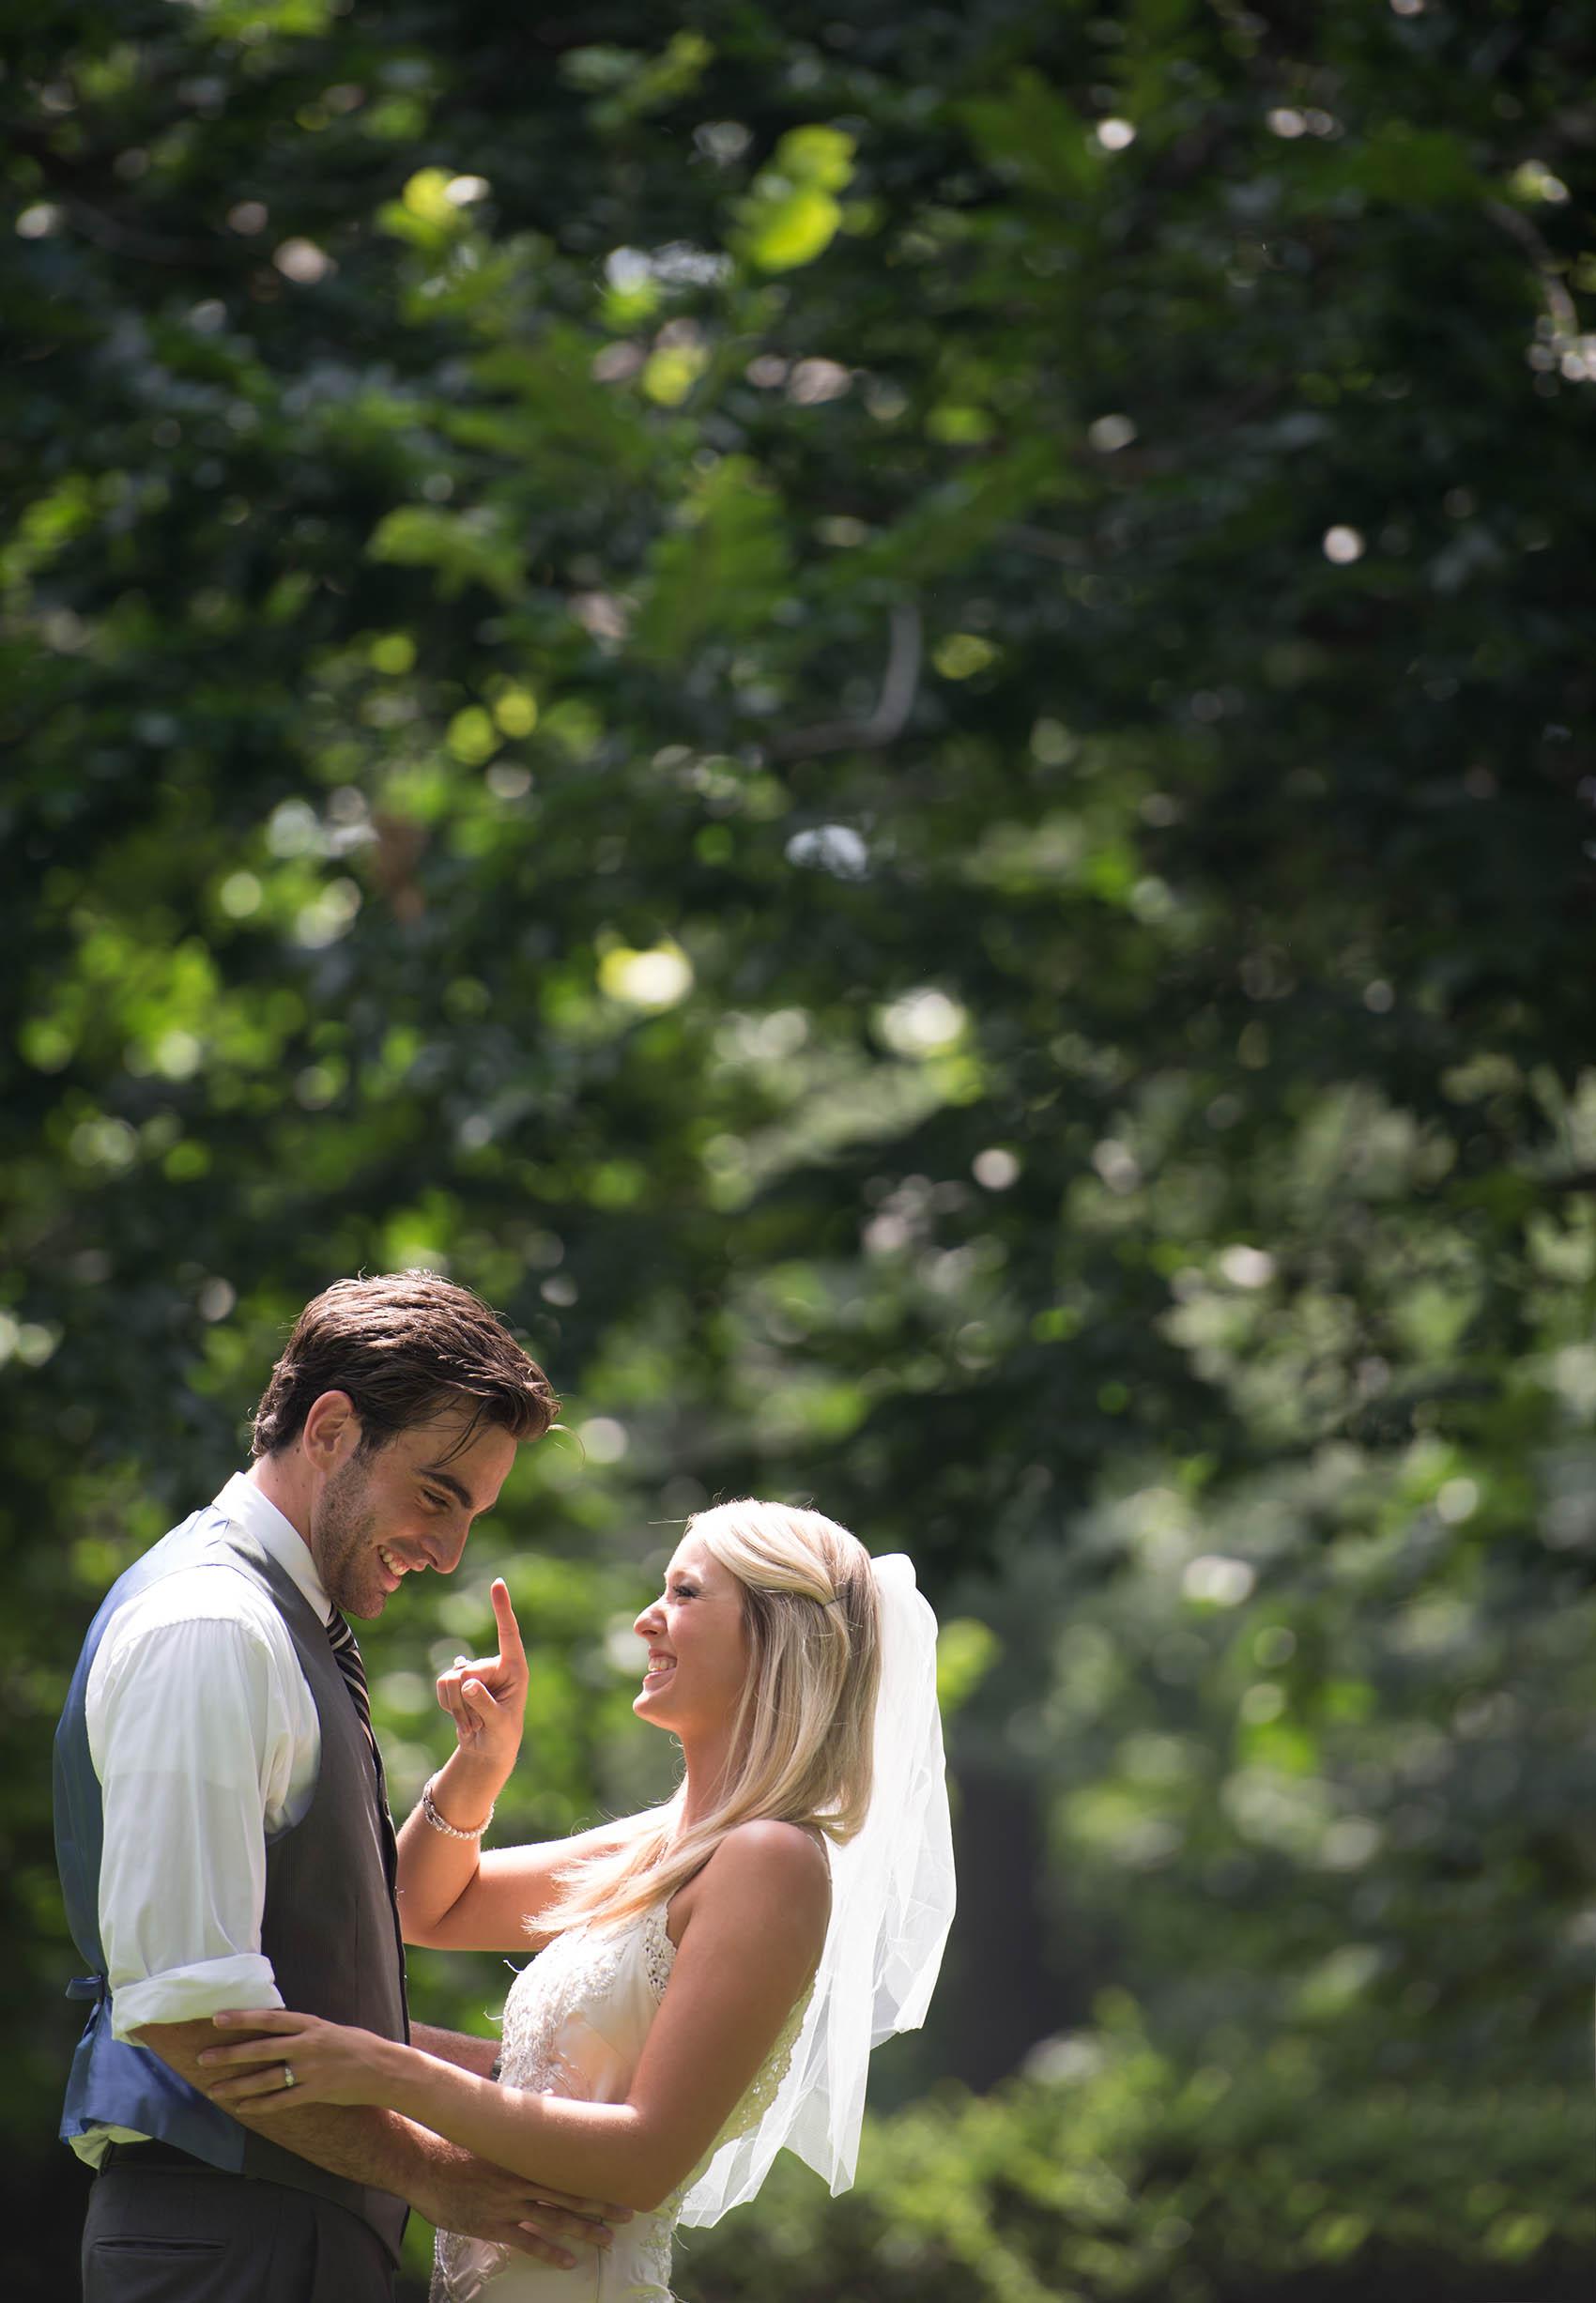 rossington hall wedding photography doncaster.jpg